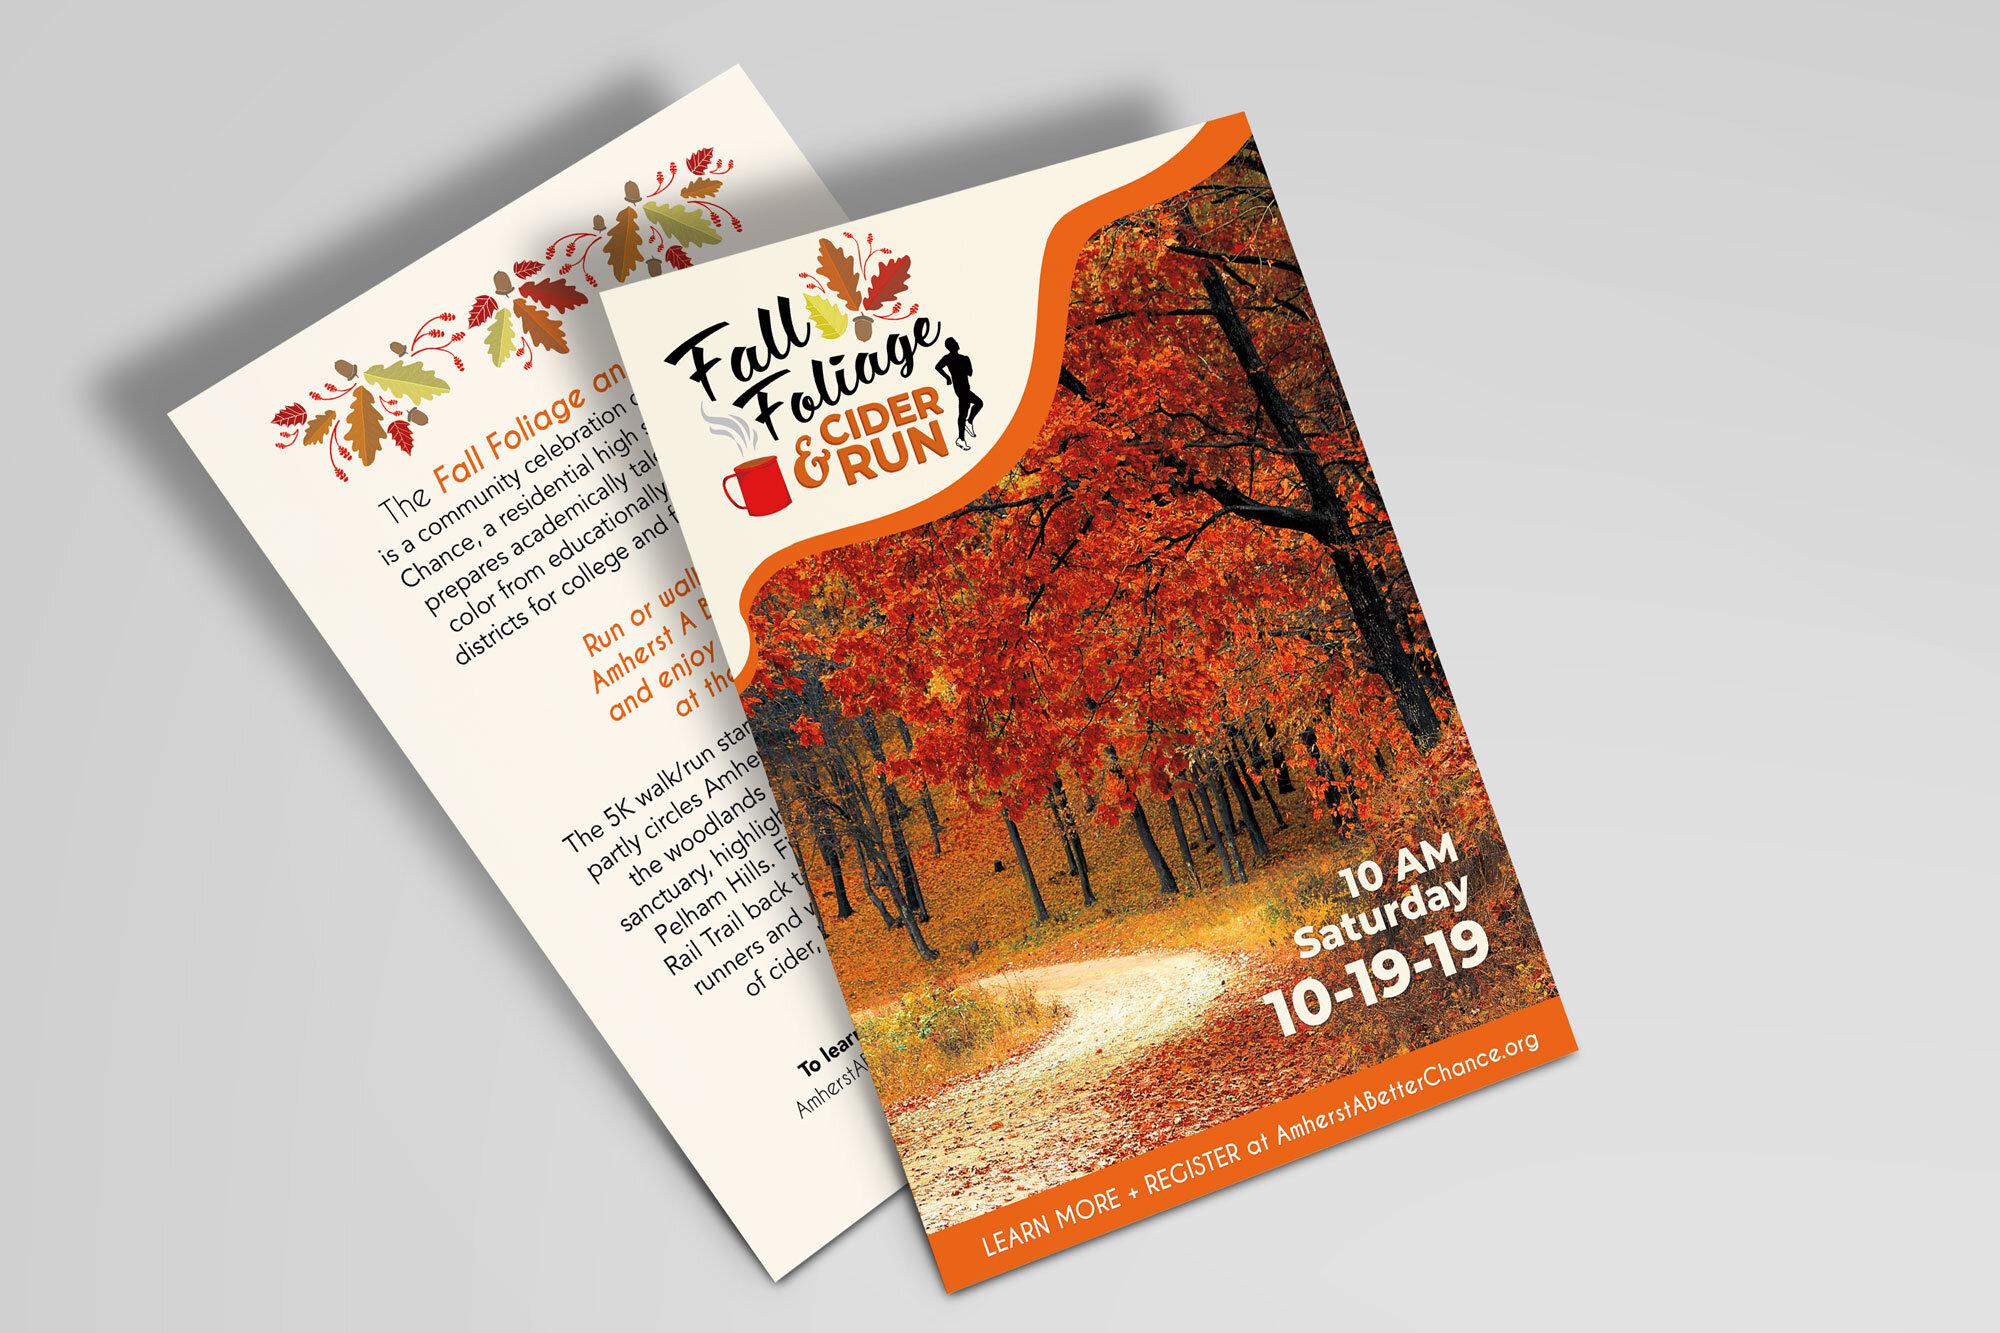 MeganAlissa.com-Postcard-Design-Nonprofit-Graphic-Design-Marketing-Fall-Run-Amherst-MA.jpg